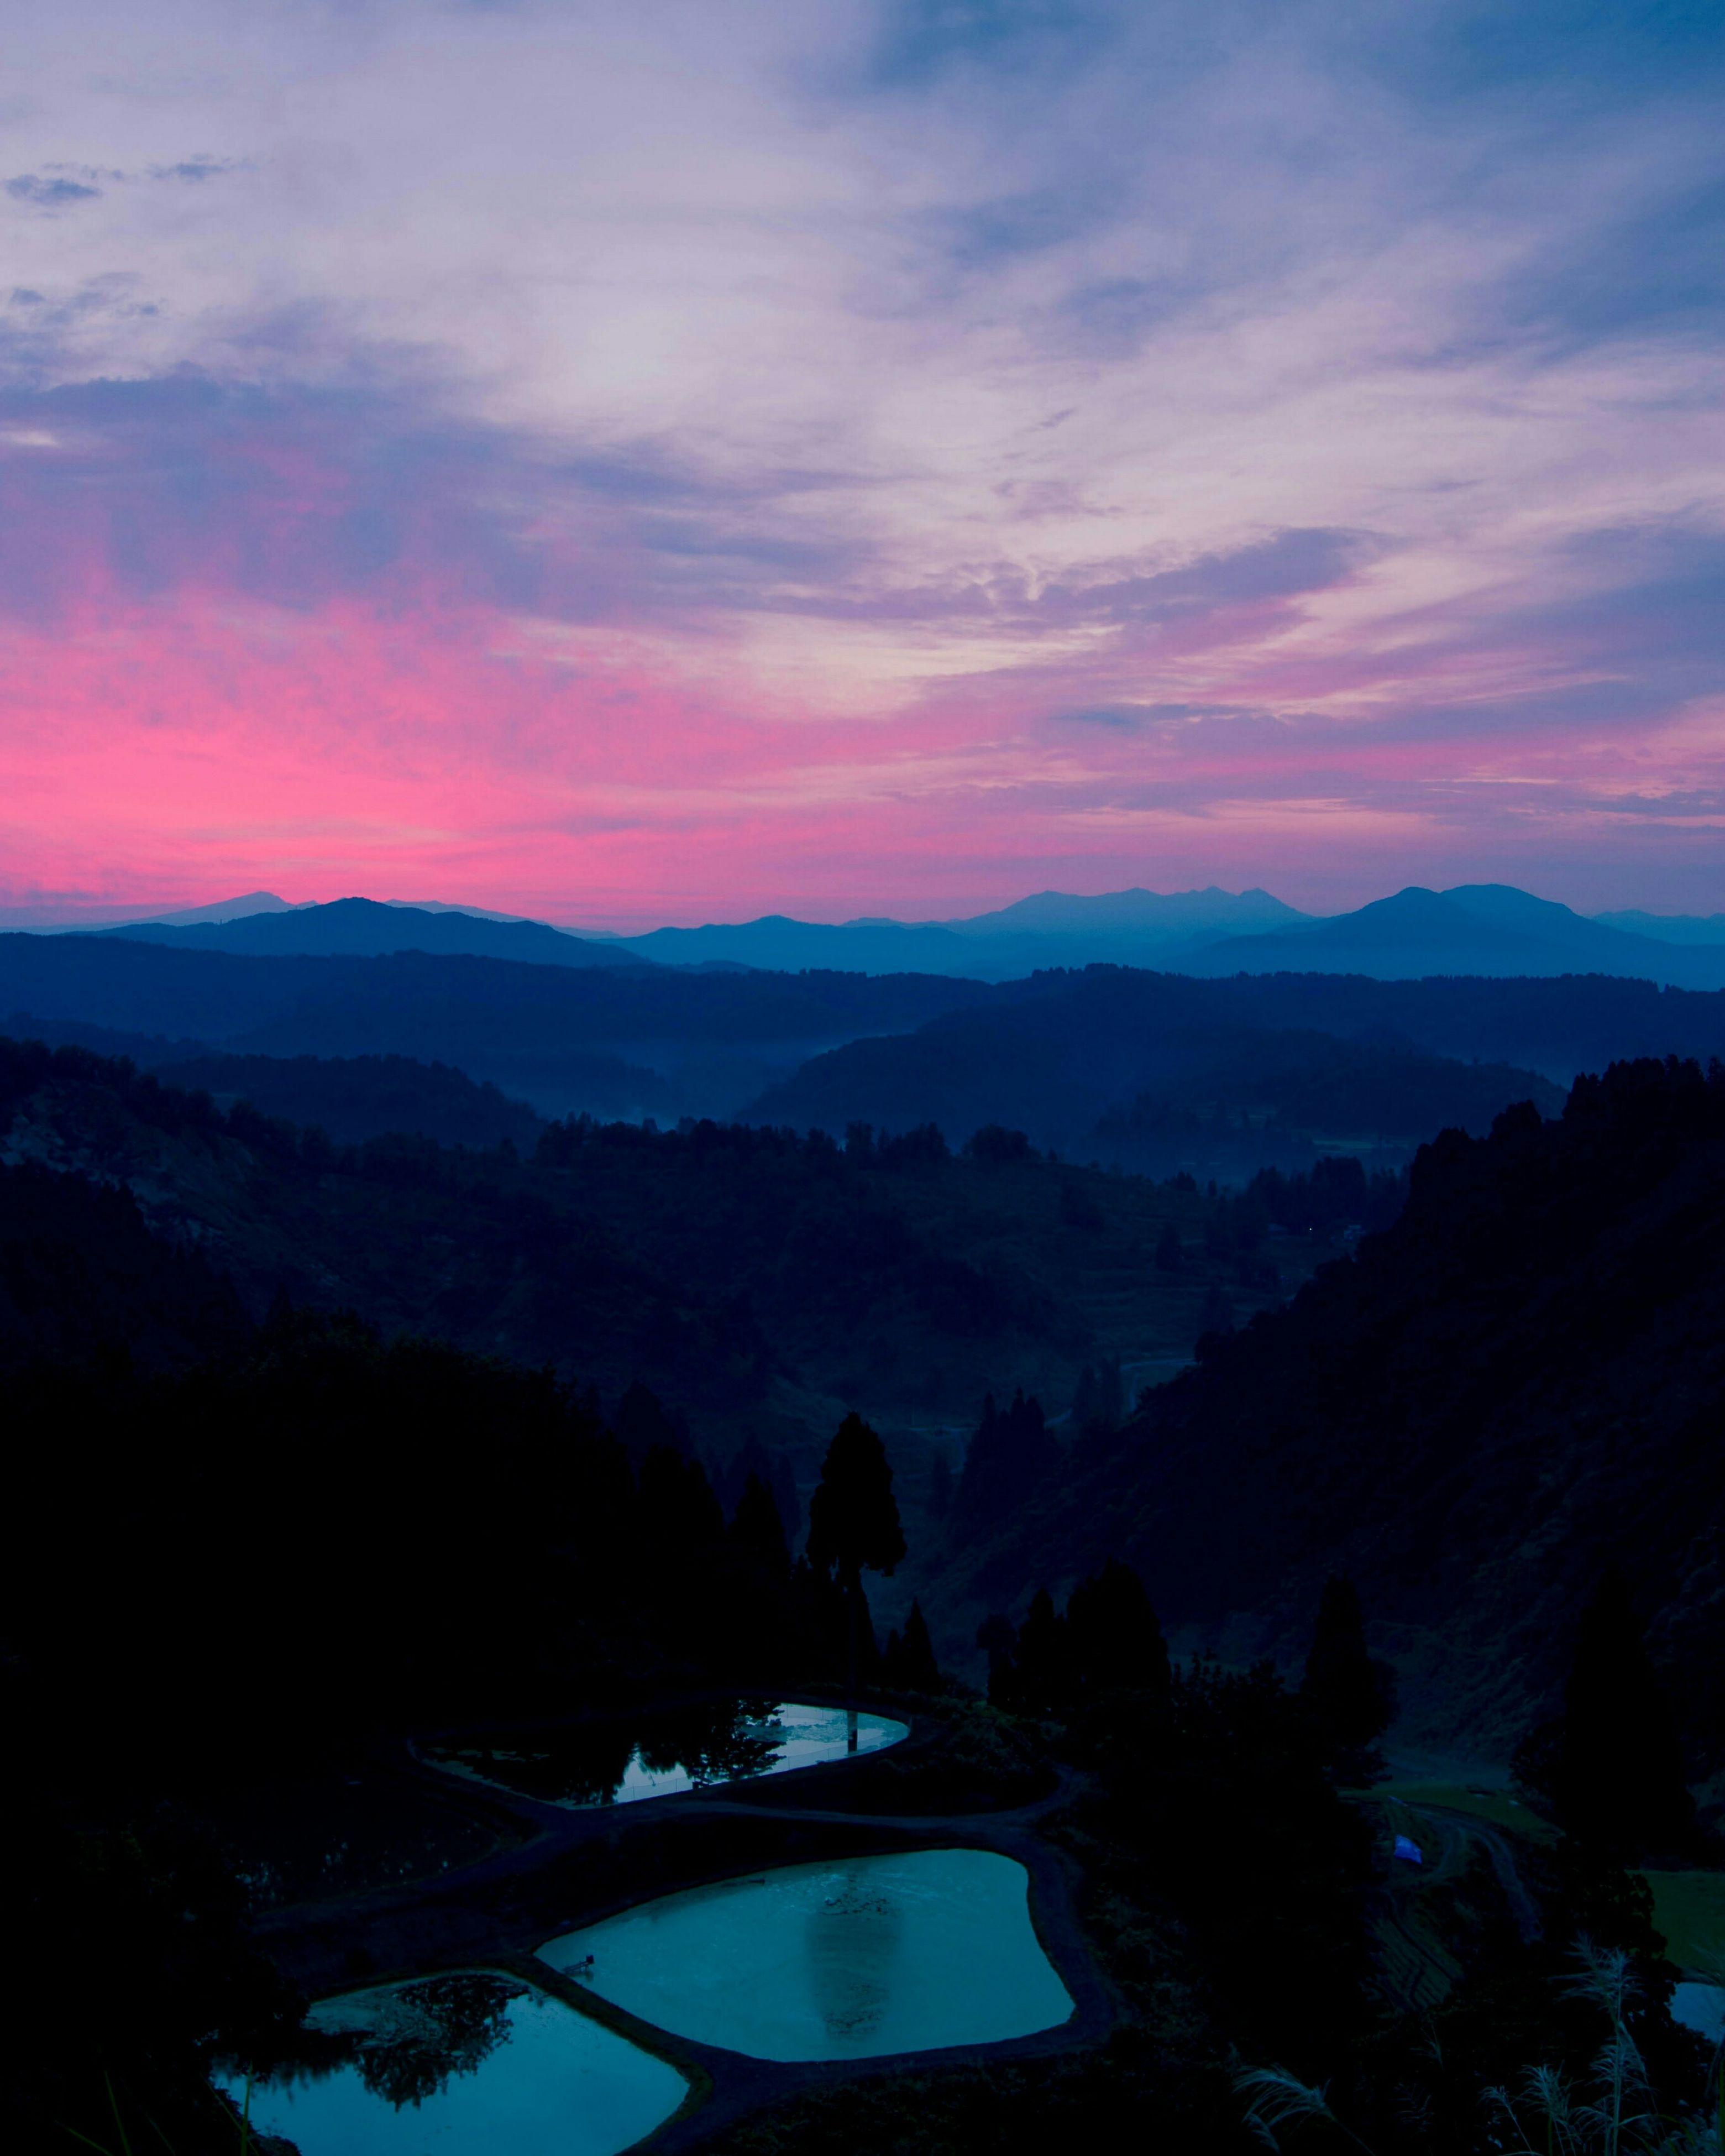 mountain, sunset, mountain range, scenics, sky, tranquil scene, beauty in nature, tranquility, silhouette, cloud - sky, landscape, nature, orange color, idyllic, cloud, dusk, lake, transportation, water, non-urban scene